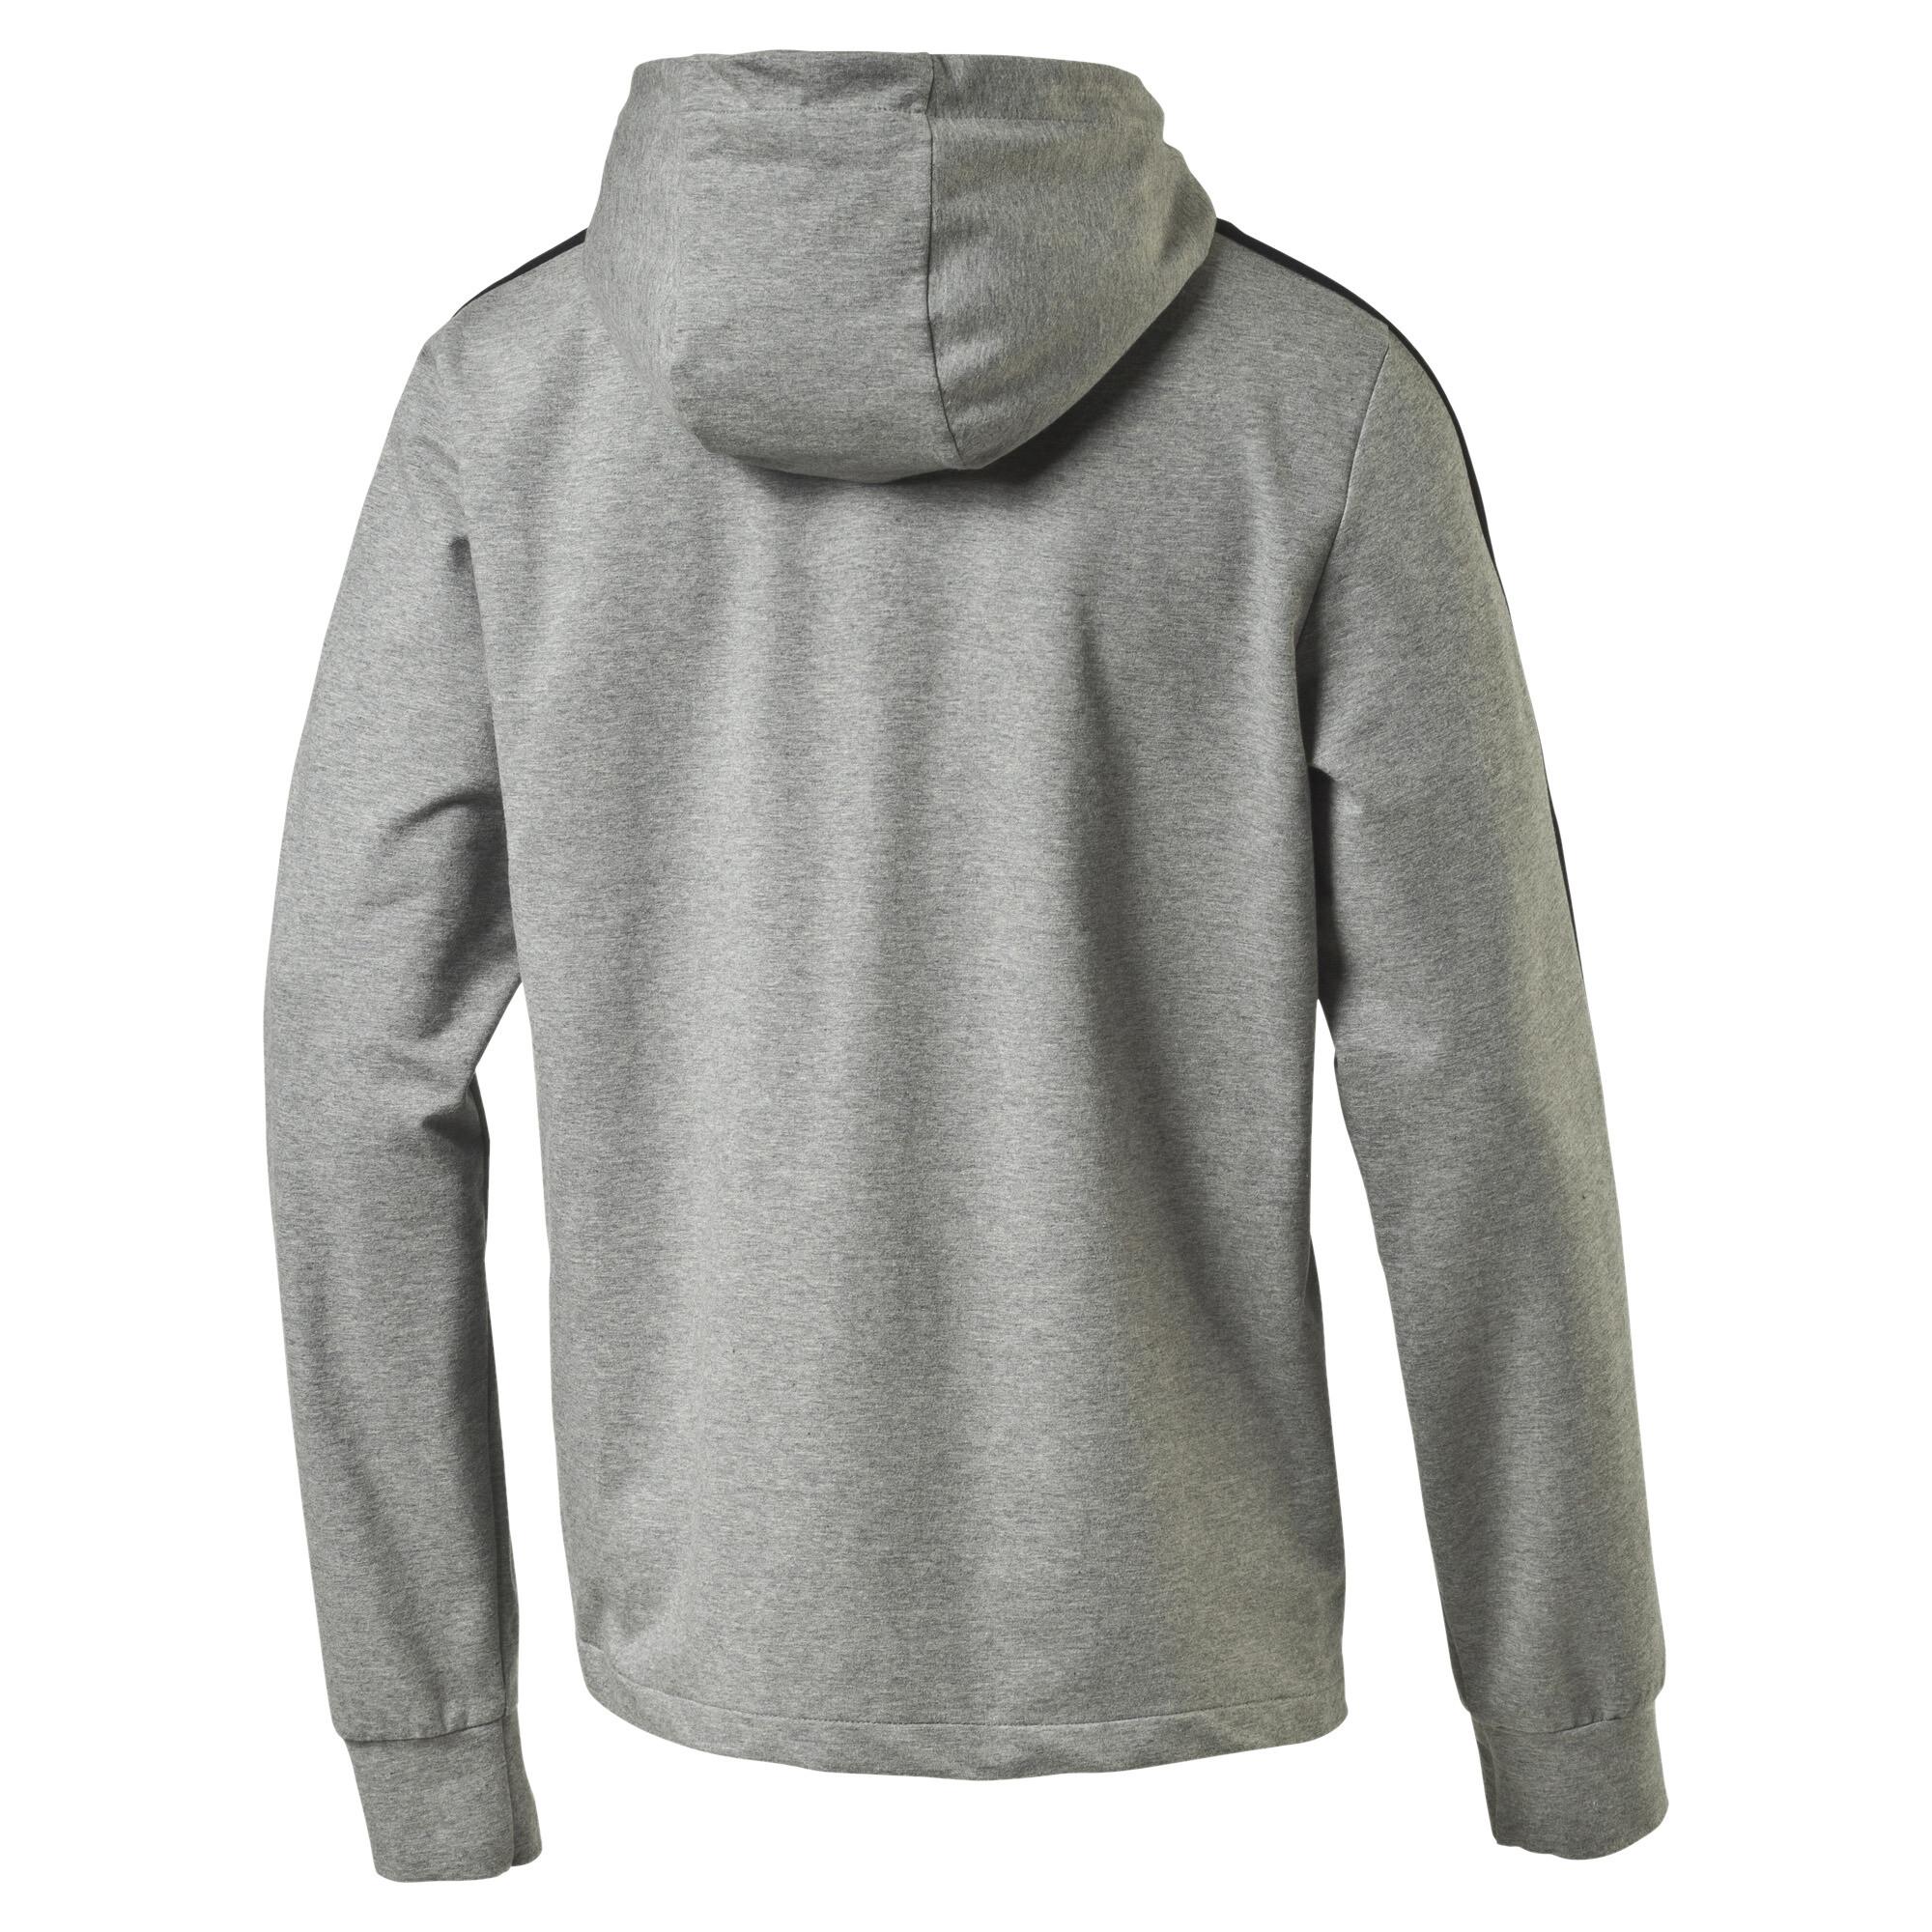 PUMA-StretchLite-Zip-Up-Hoodie-Men-Sweat-Basics thumbnail 3